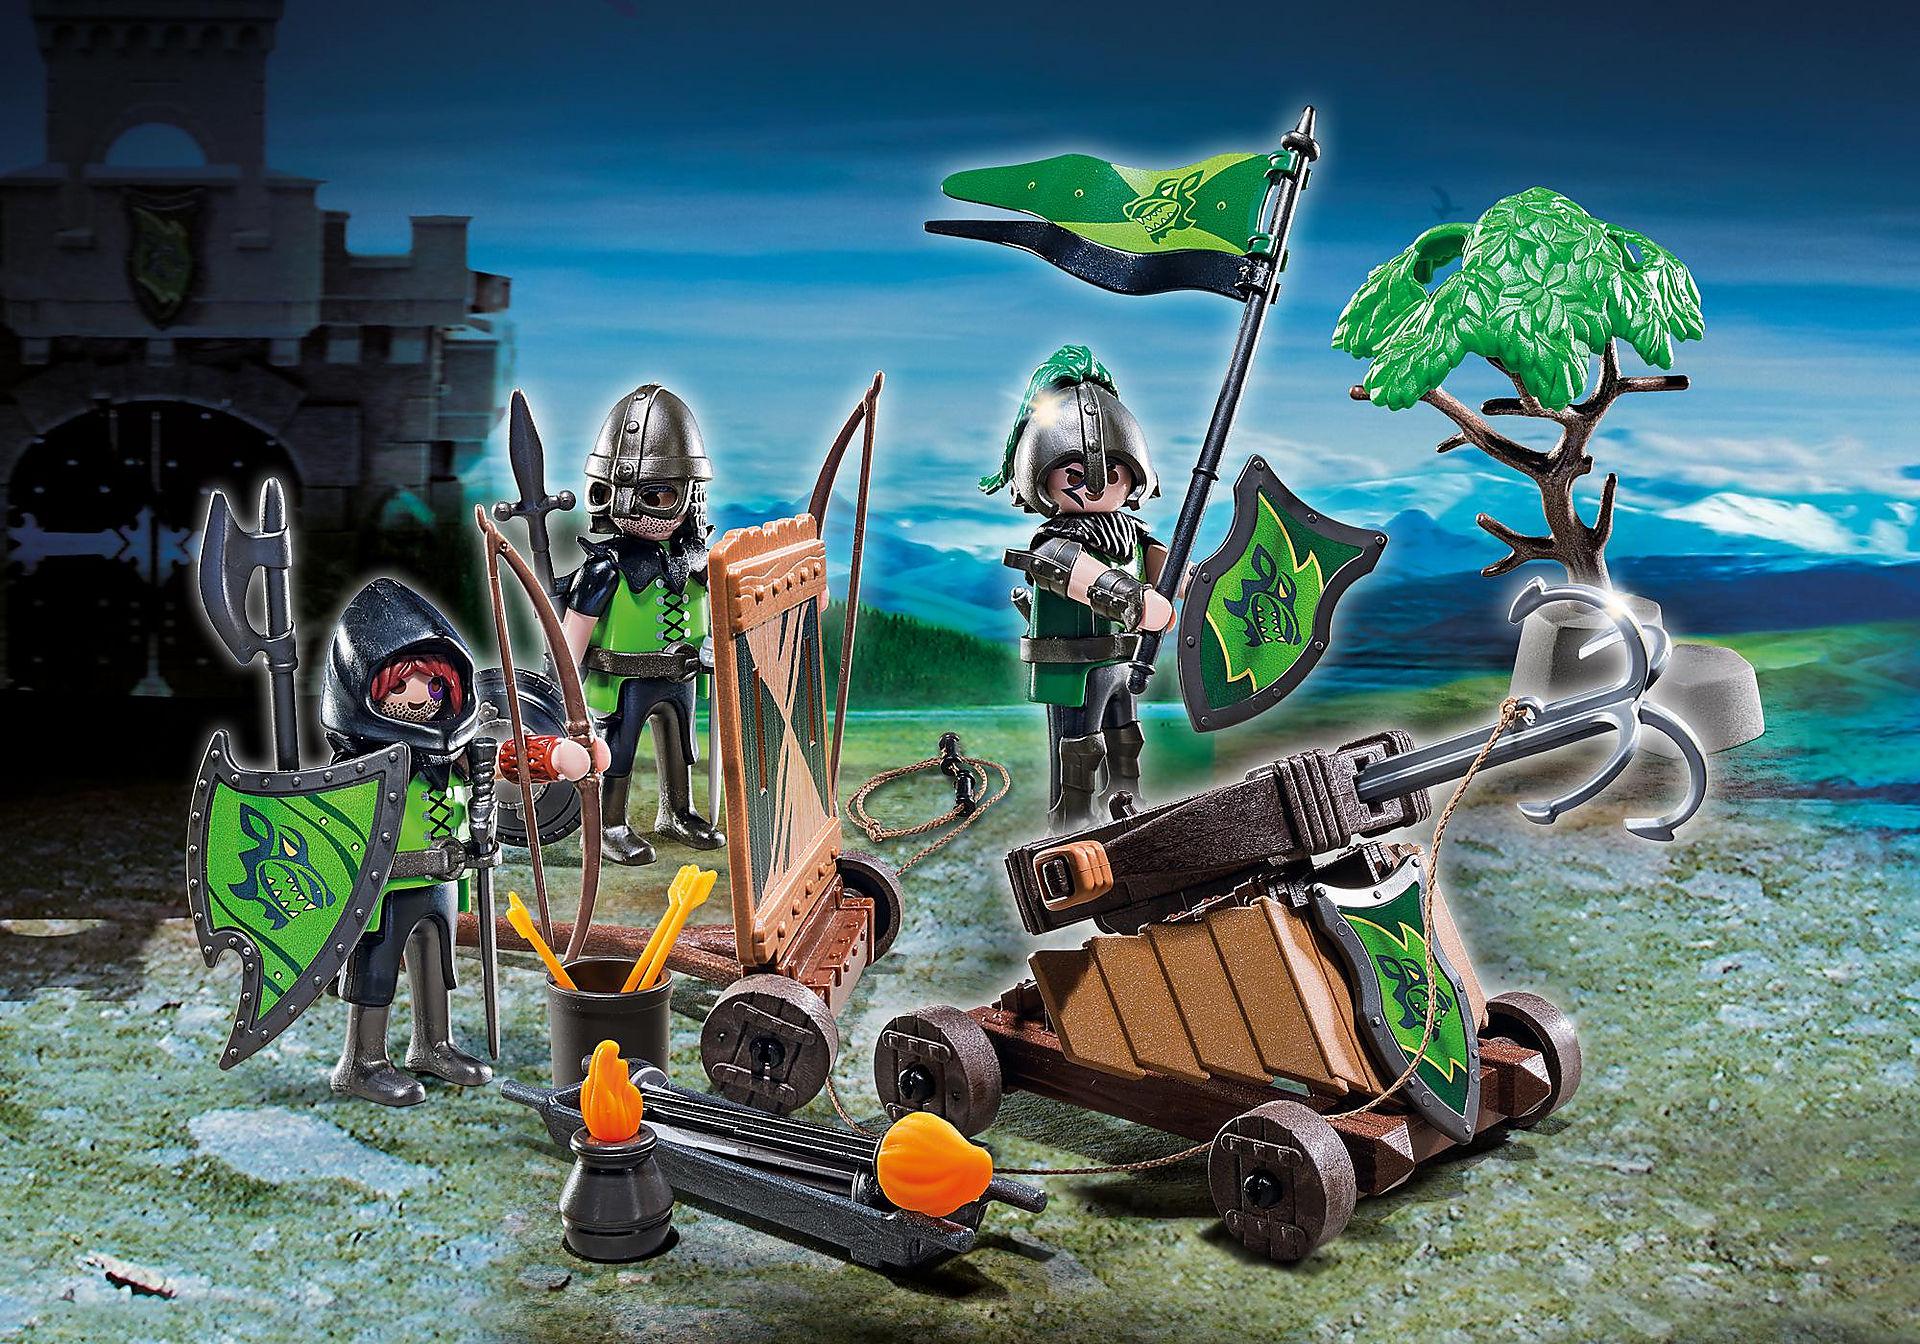 http://media.playmobil.com/i/playmobil/6041_product_detail/Рыцари: Катапульта Рыцарей Волка